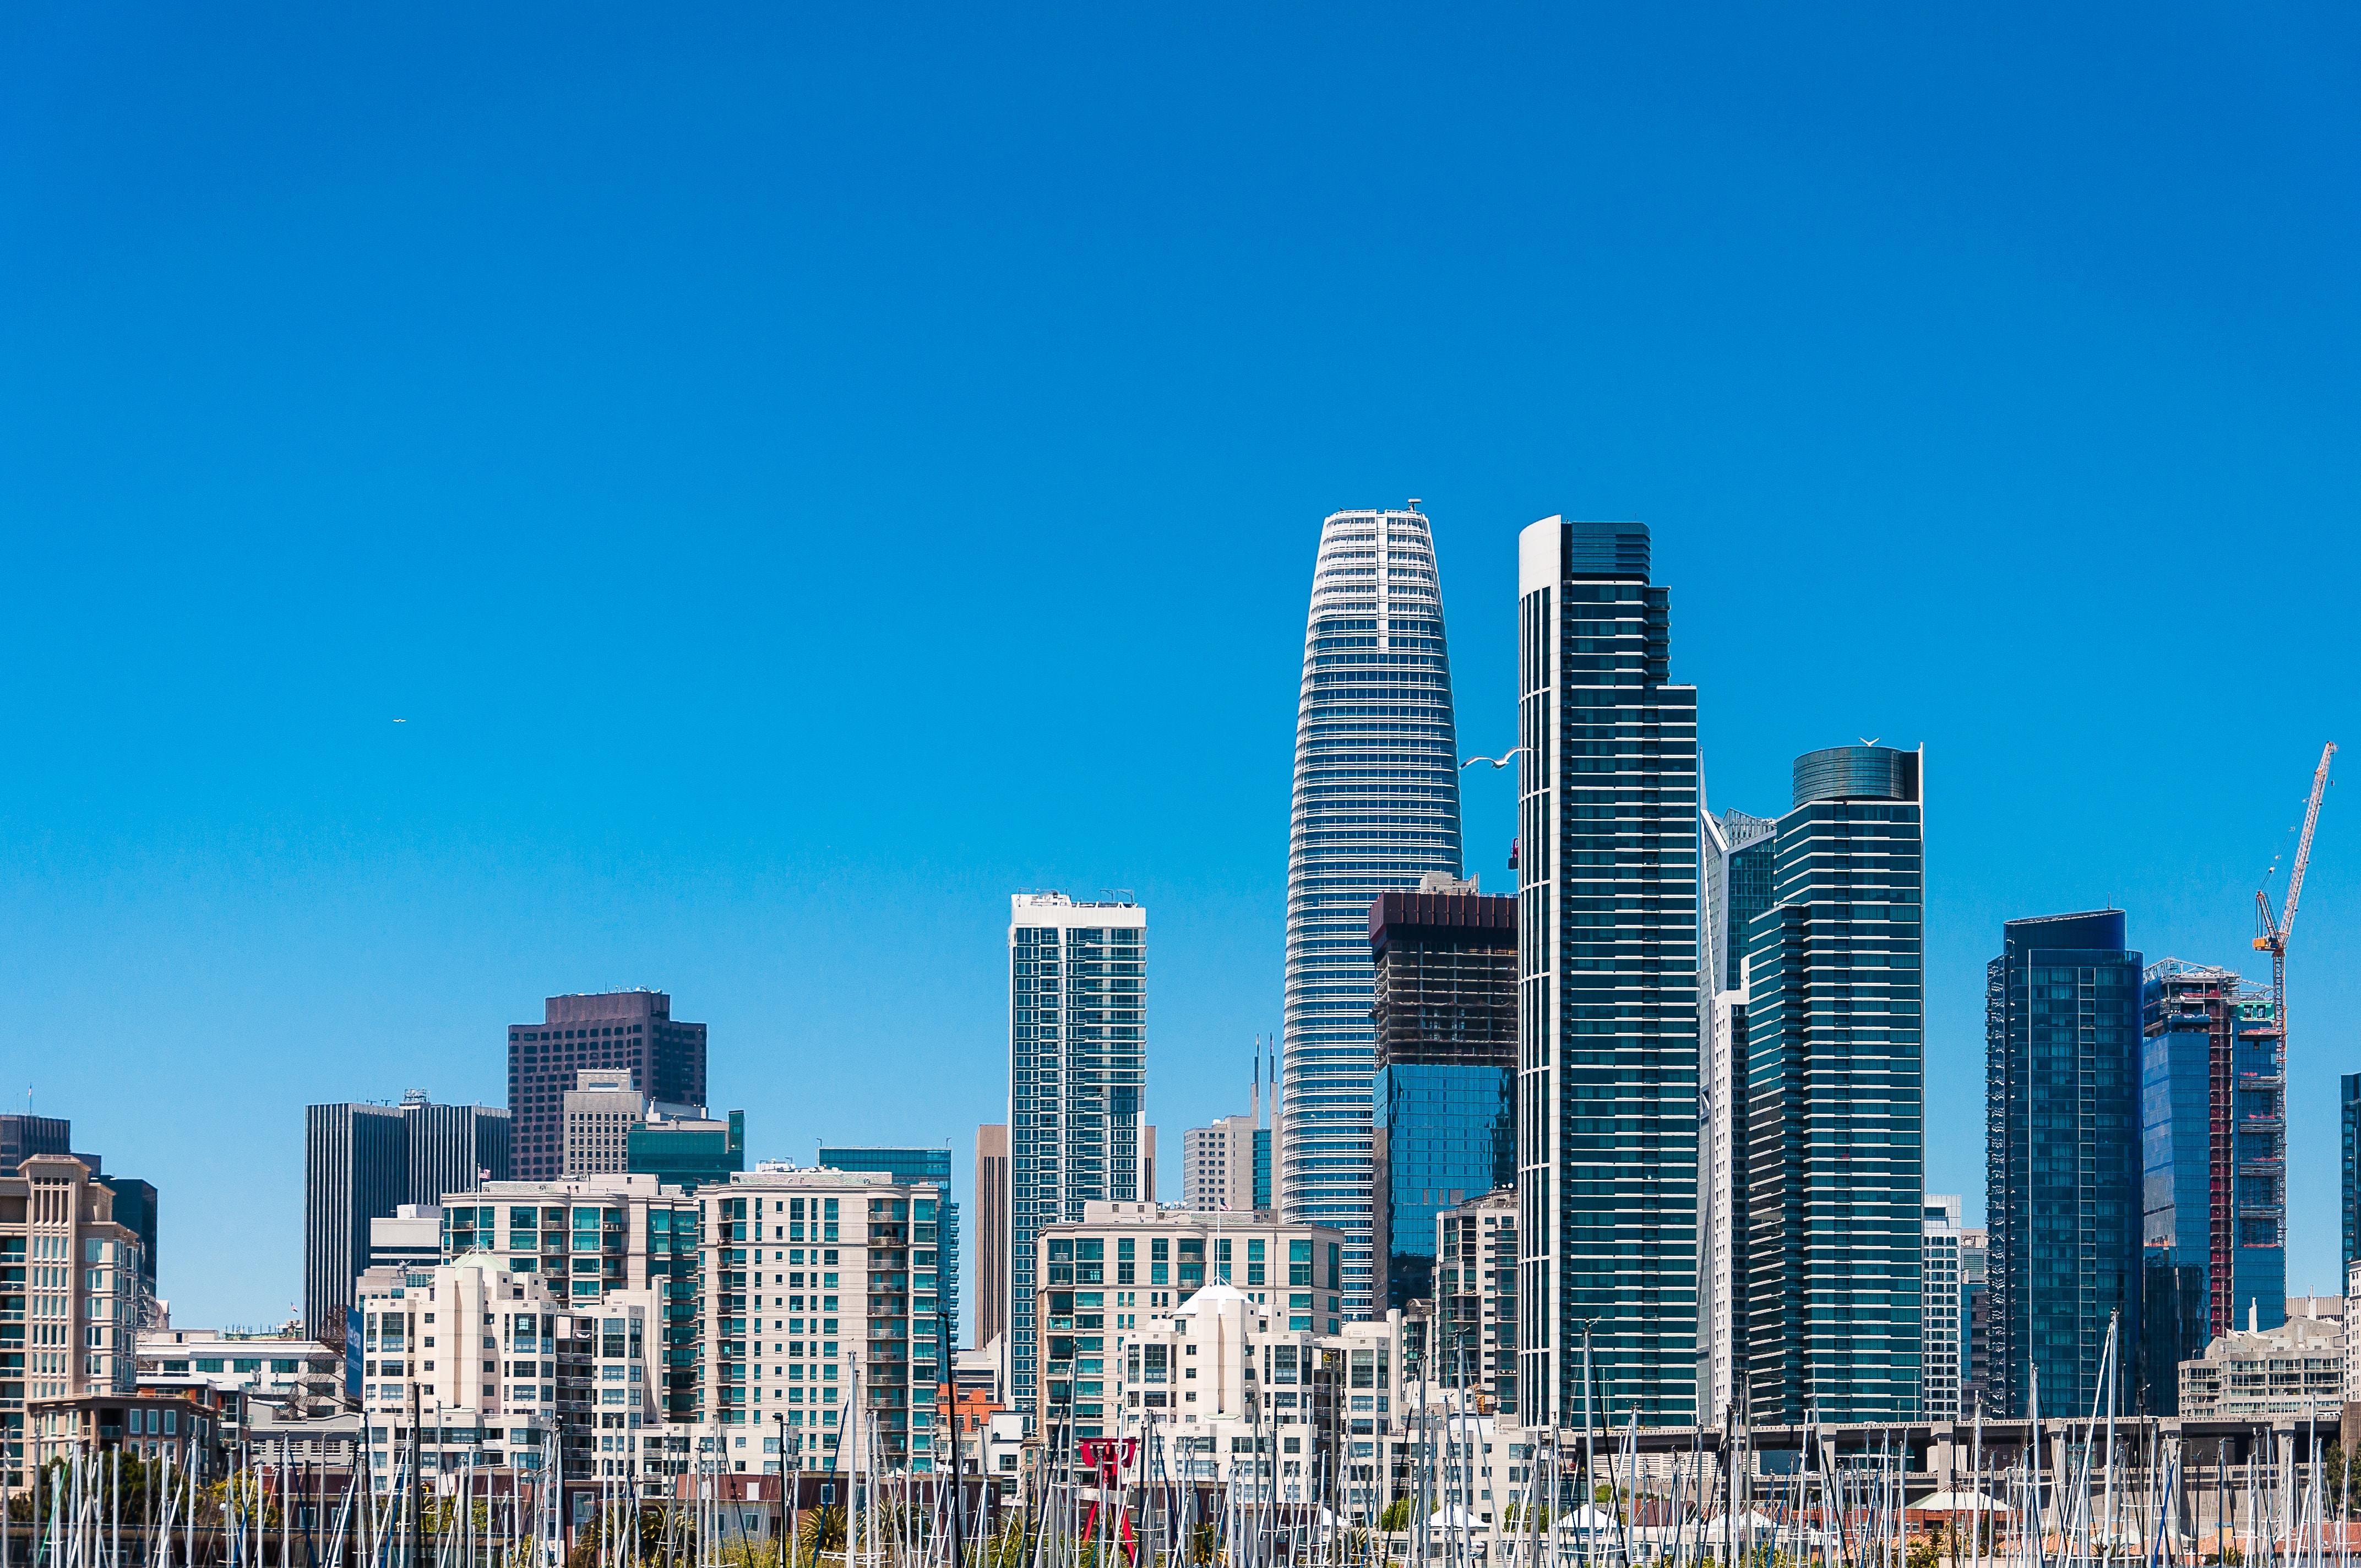 city under blue sky at daytime